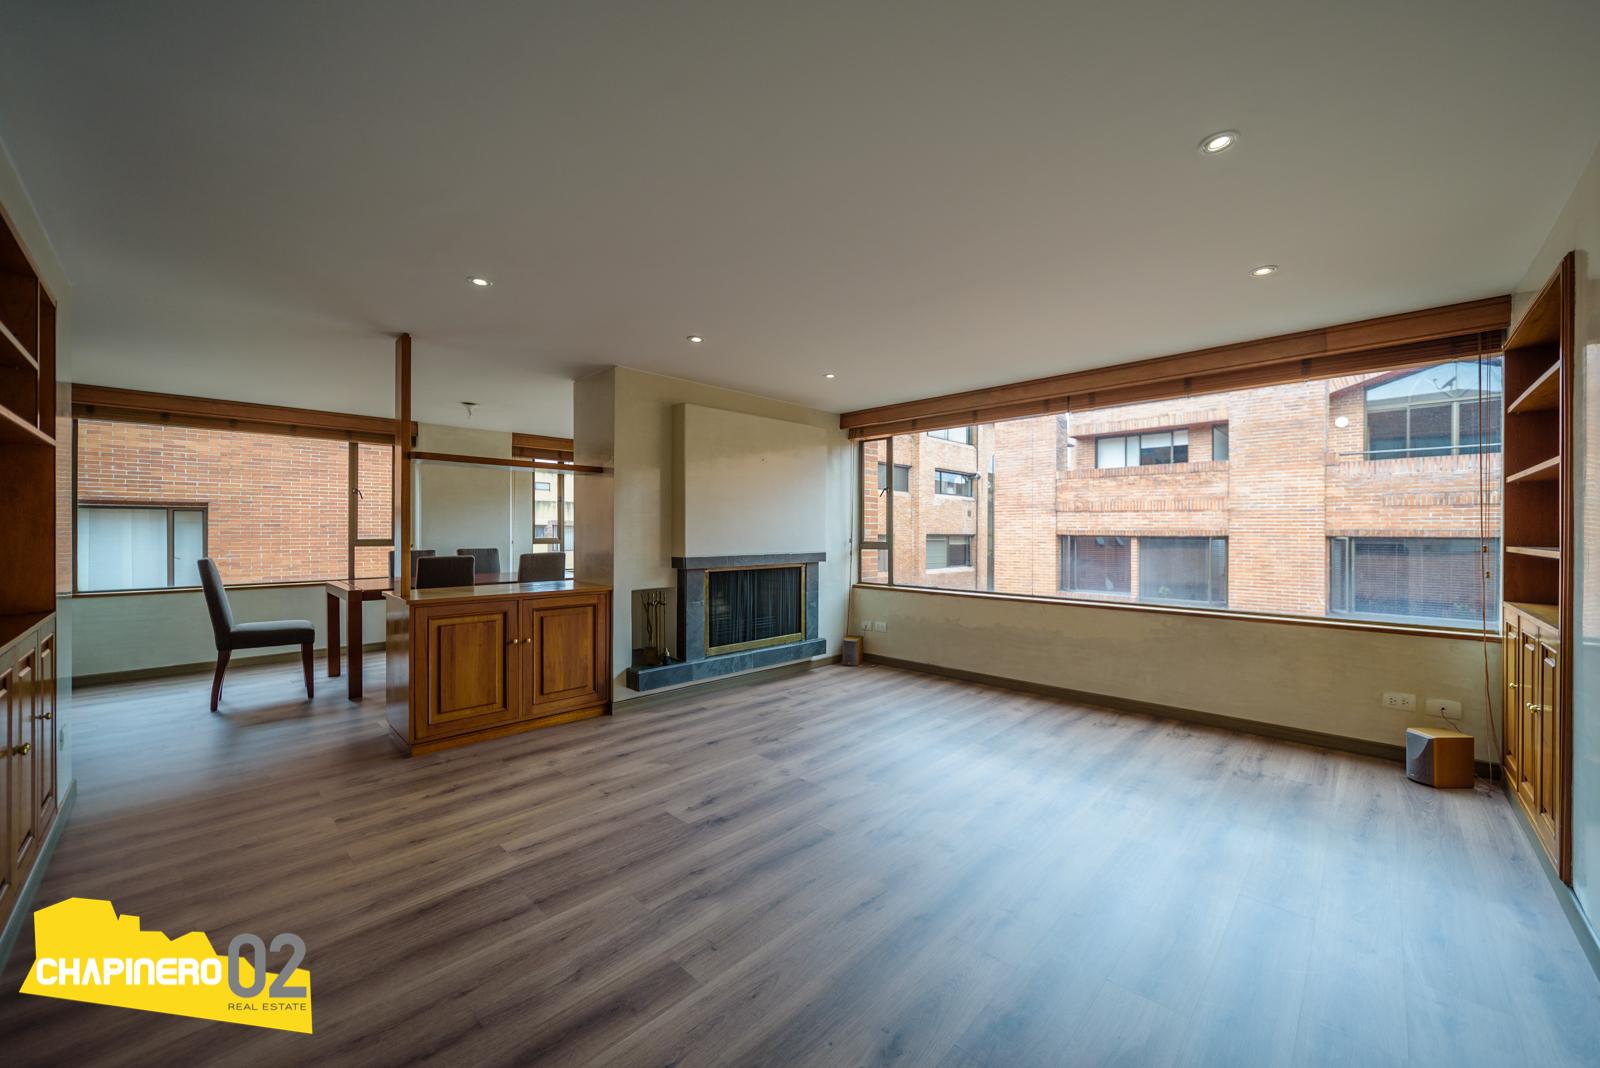 Apto Venta :: 155 m² :: Chicó Norte 2 :: $850M